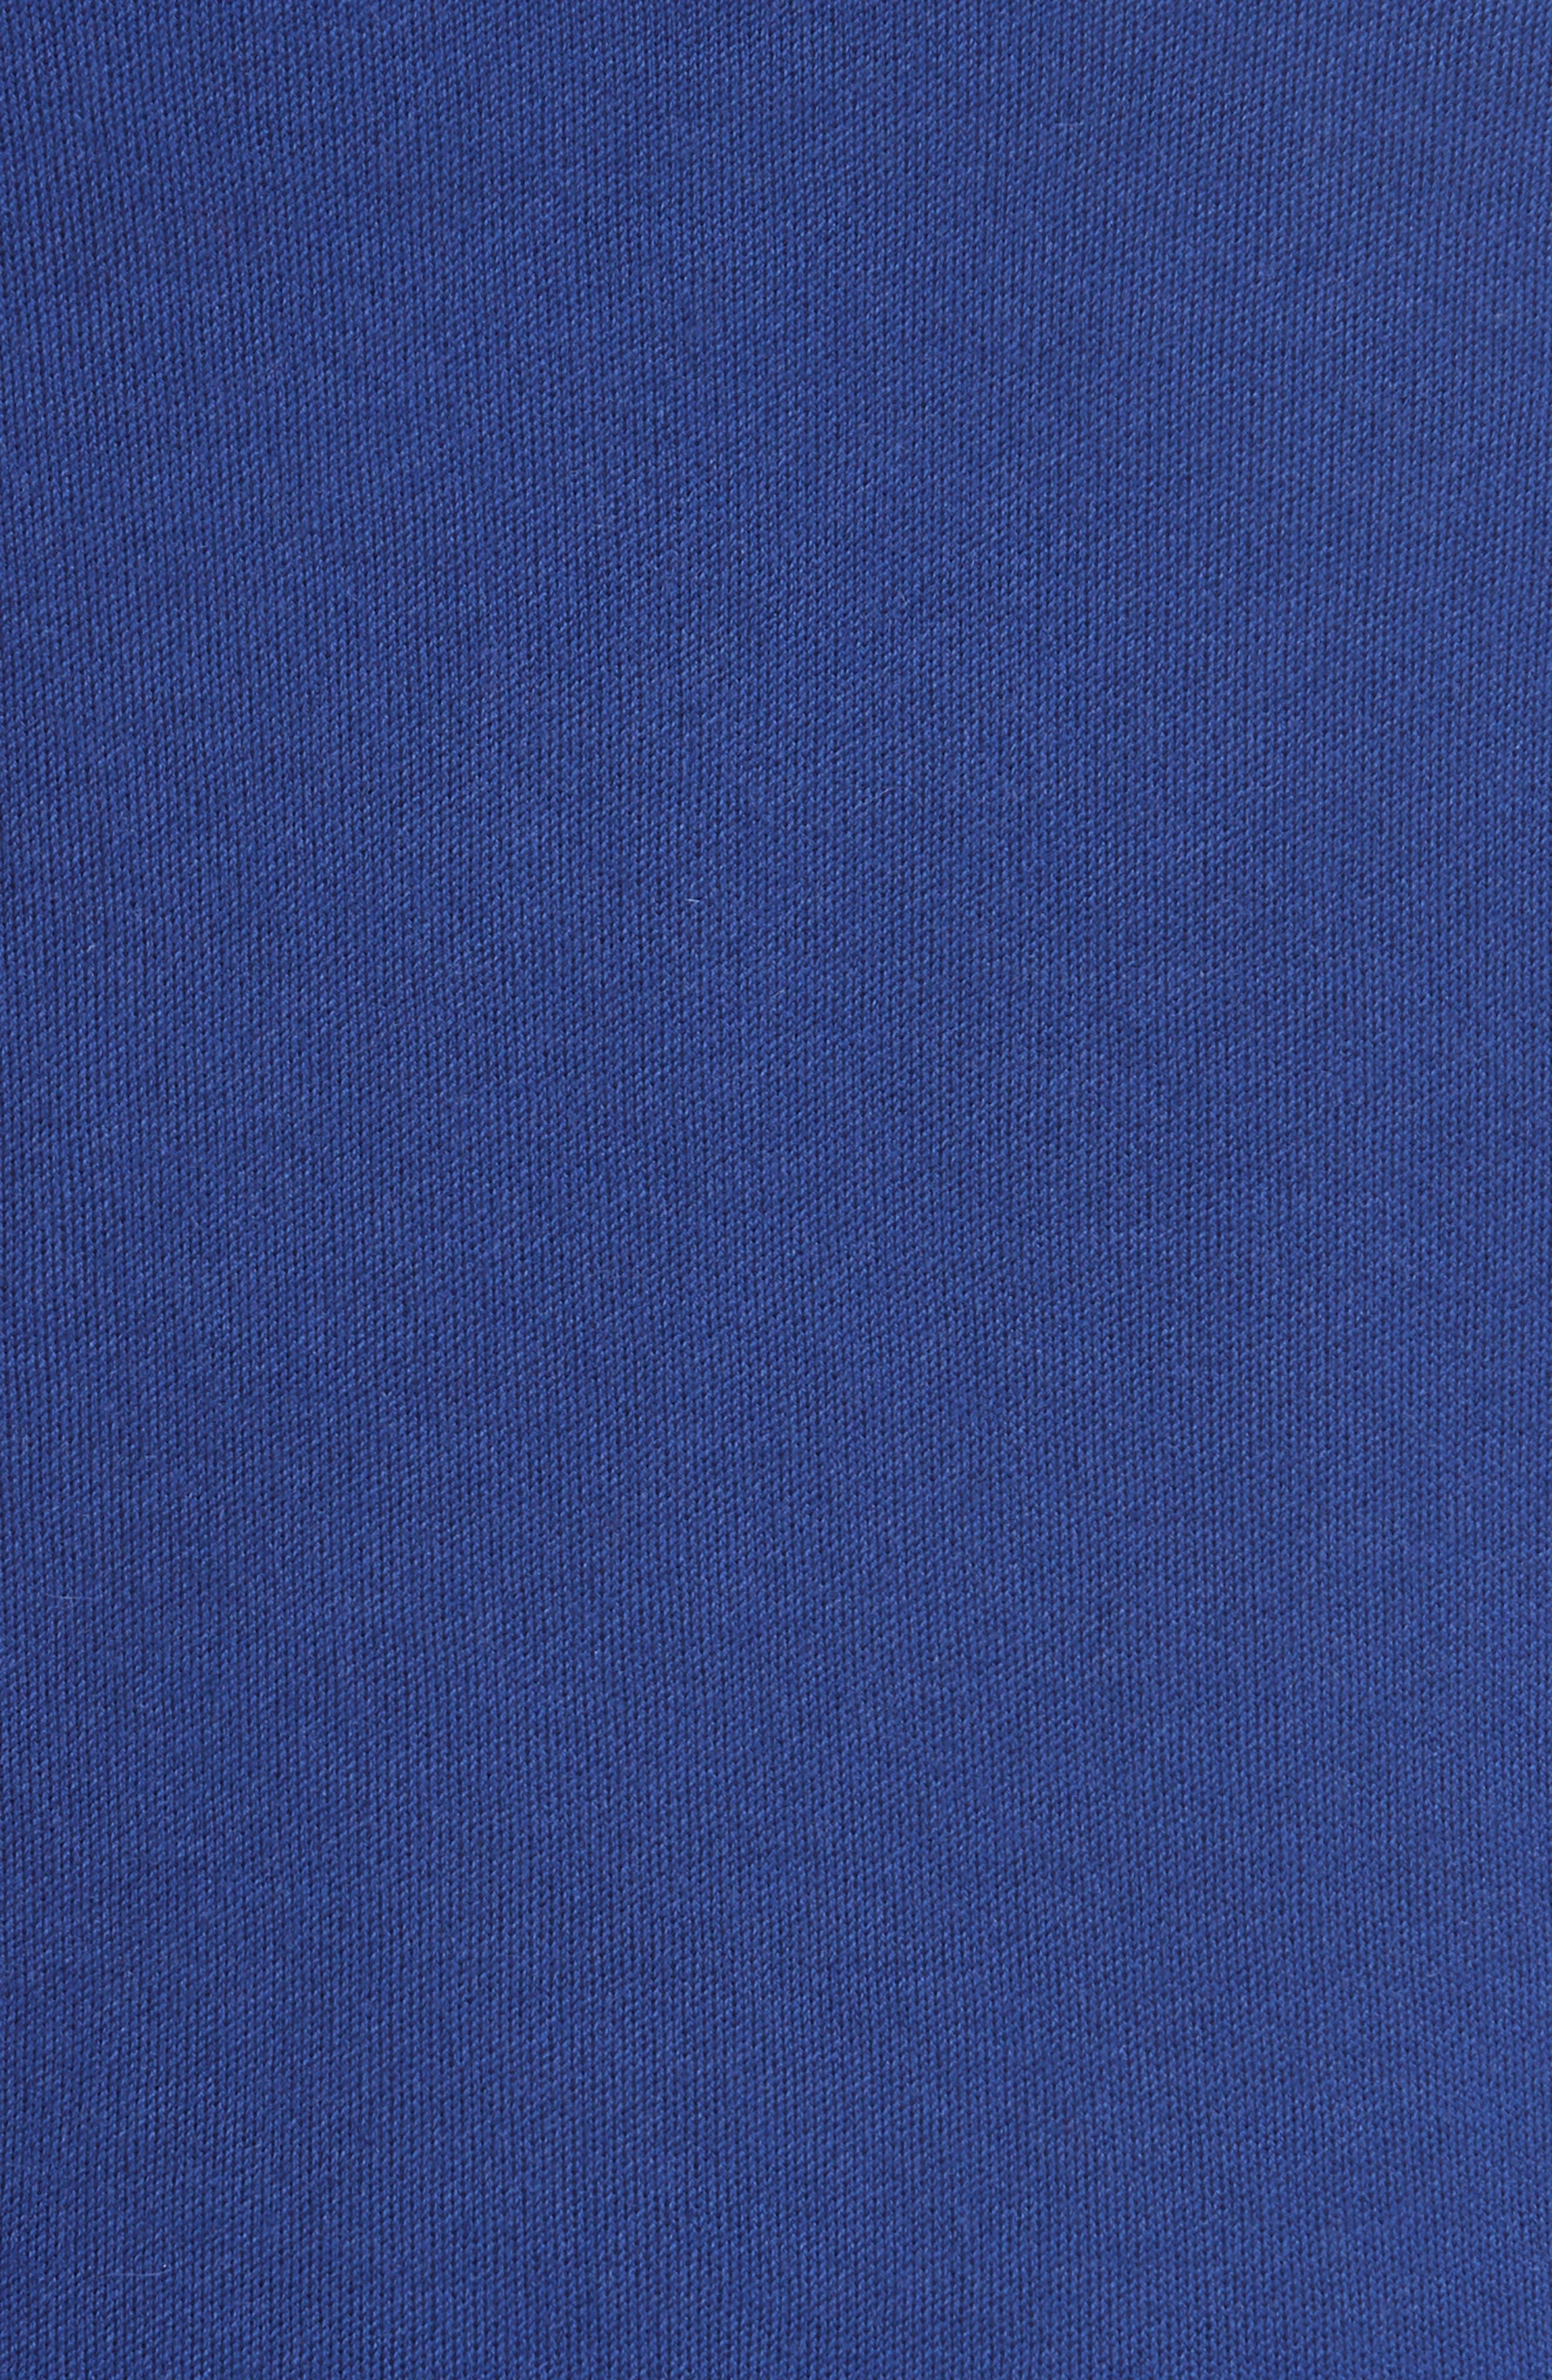 Long Cashmere Cardigan,                             Alternate thumbnail 6, color,                             LAPIS